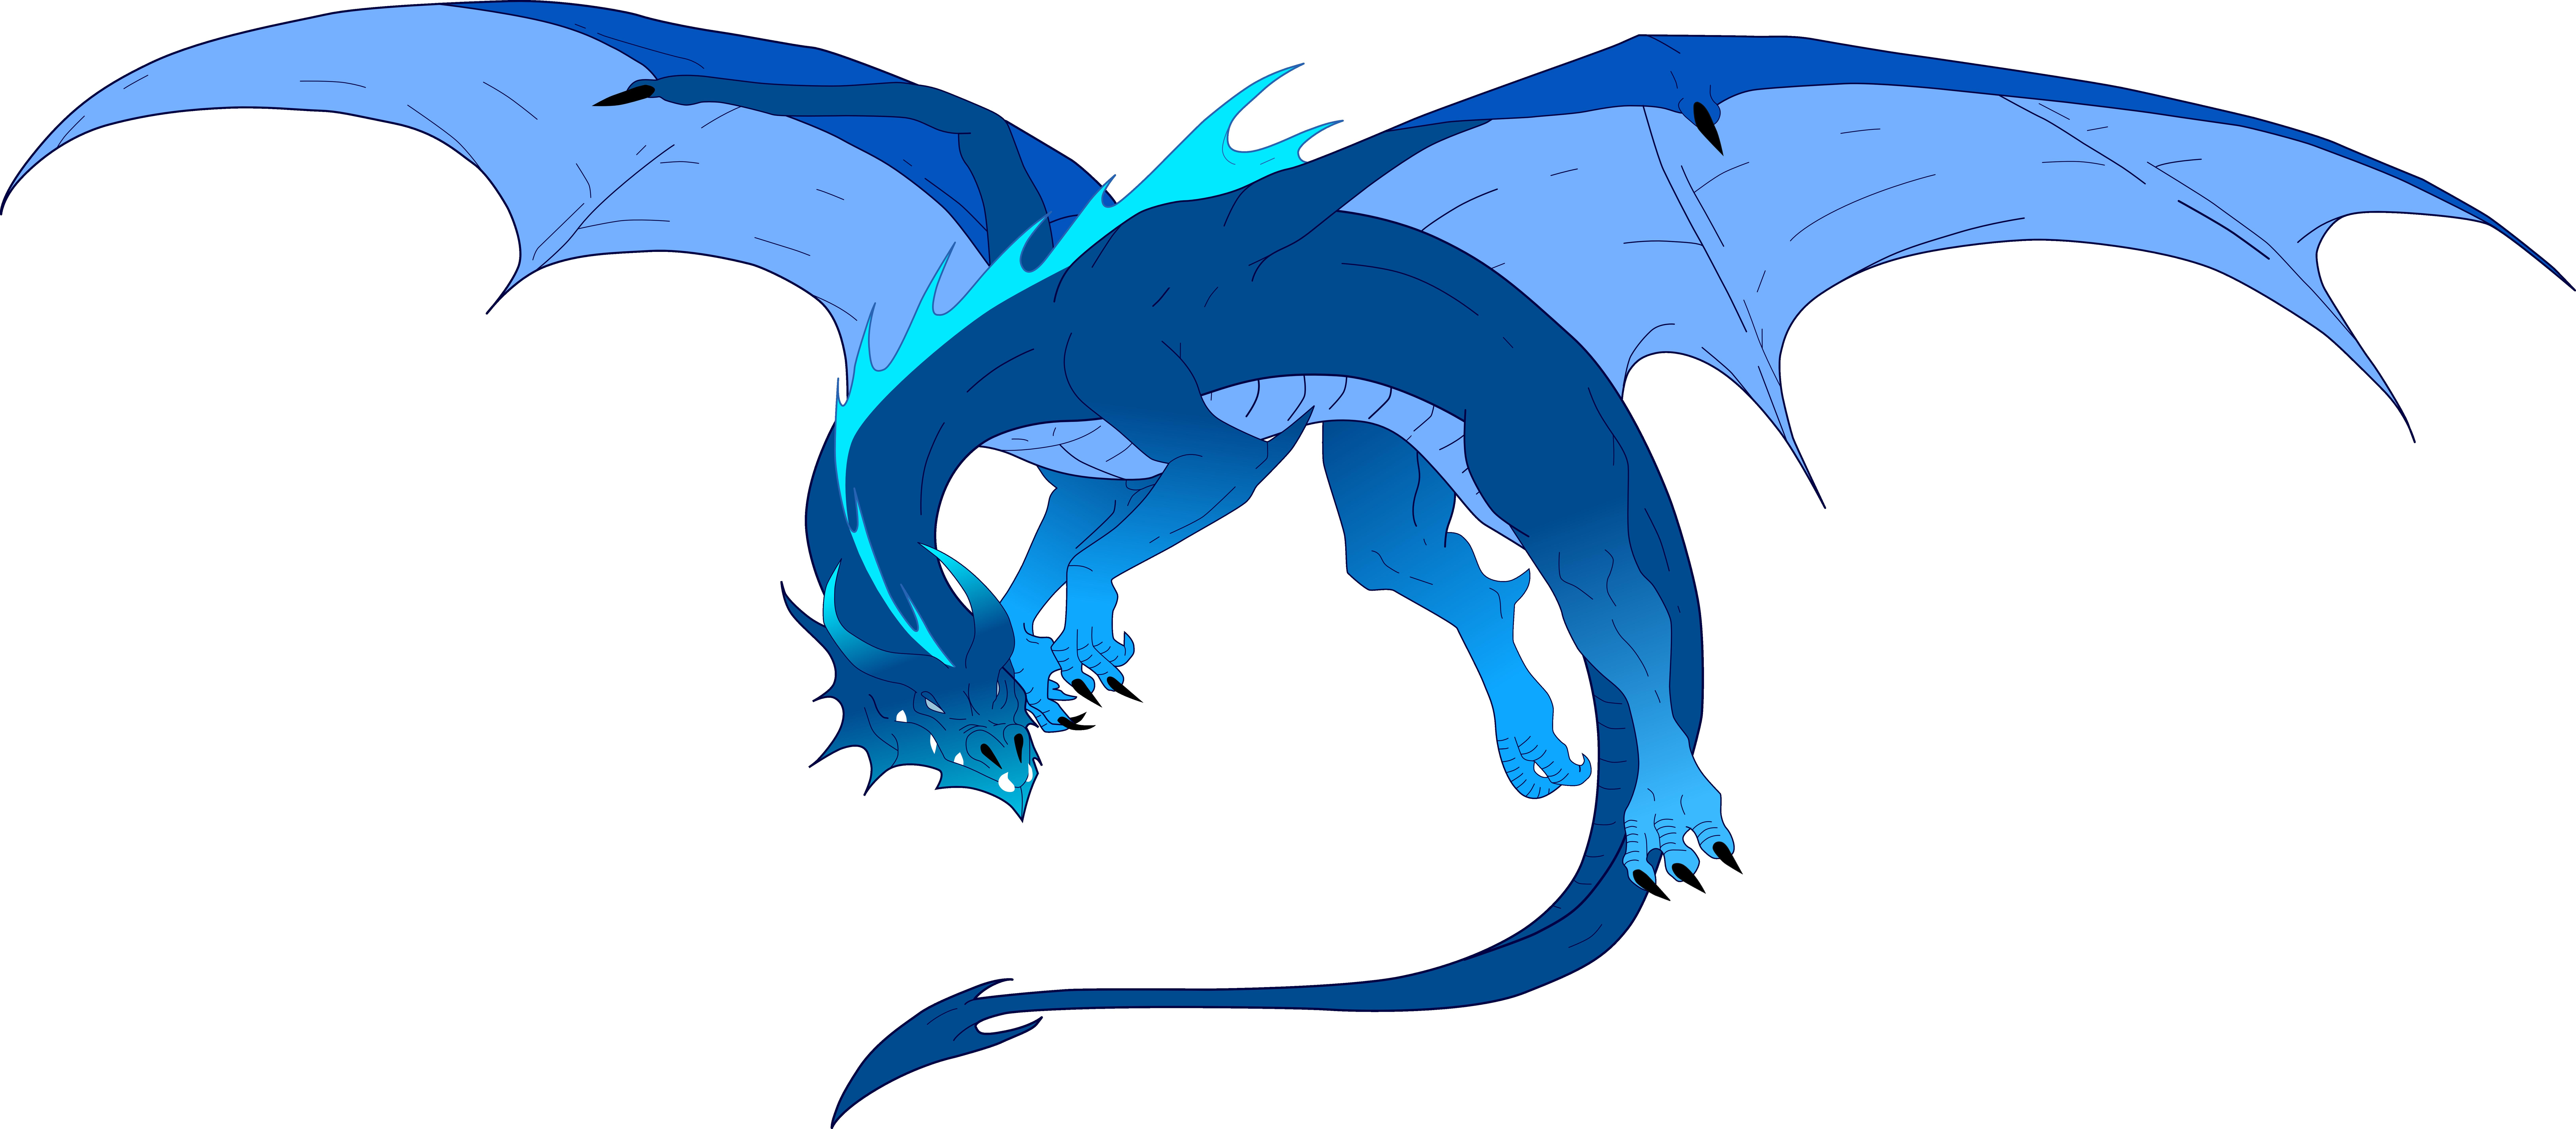 Dragon clipart friendly dragon. Frost as a blast